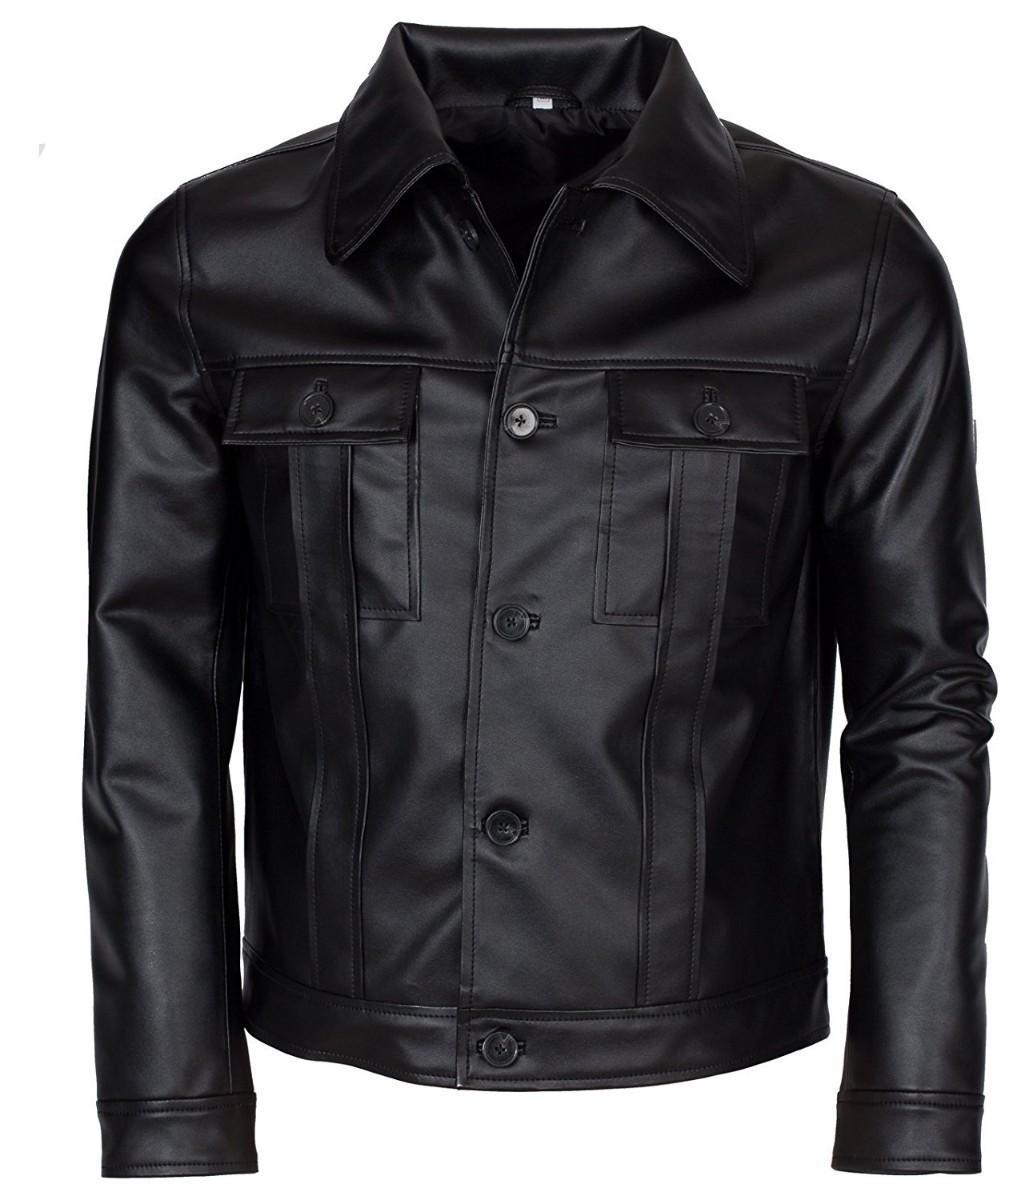 b611a5560e18 Feather Hide Mens Clothing Elvis Presley Inspired Black Rockstar Genuine Leather  Jacket